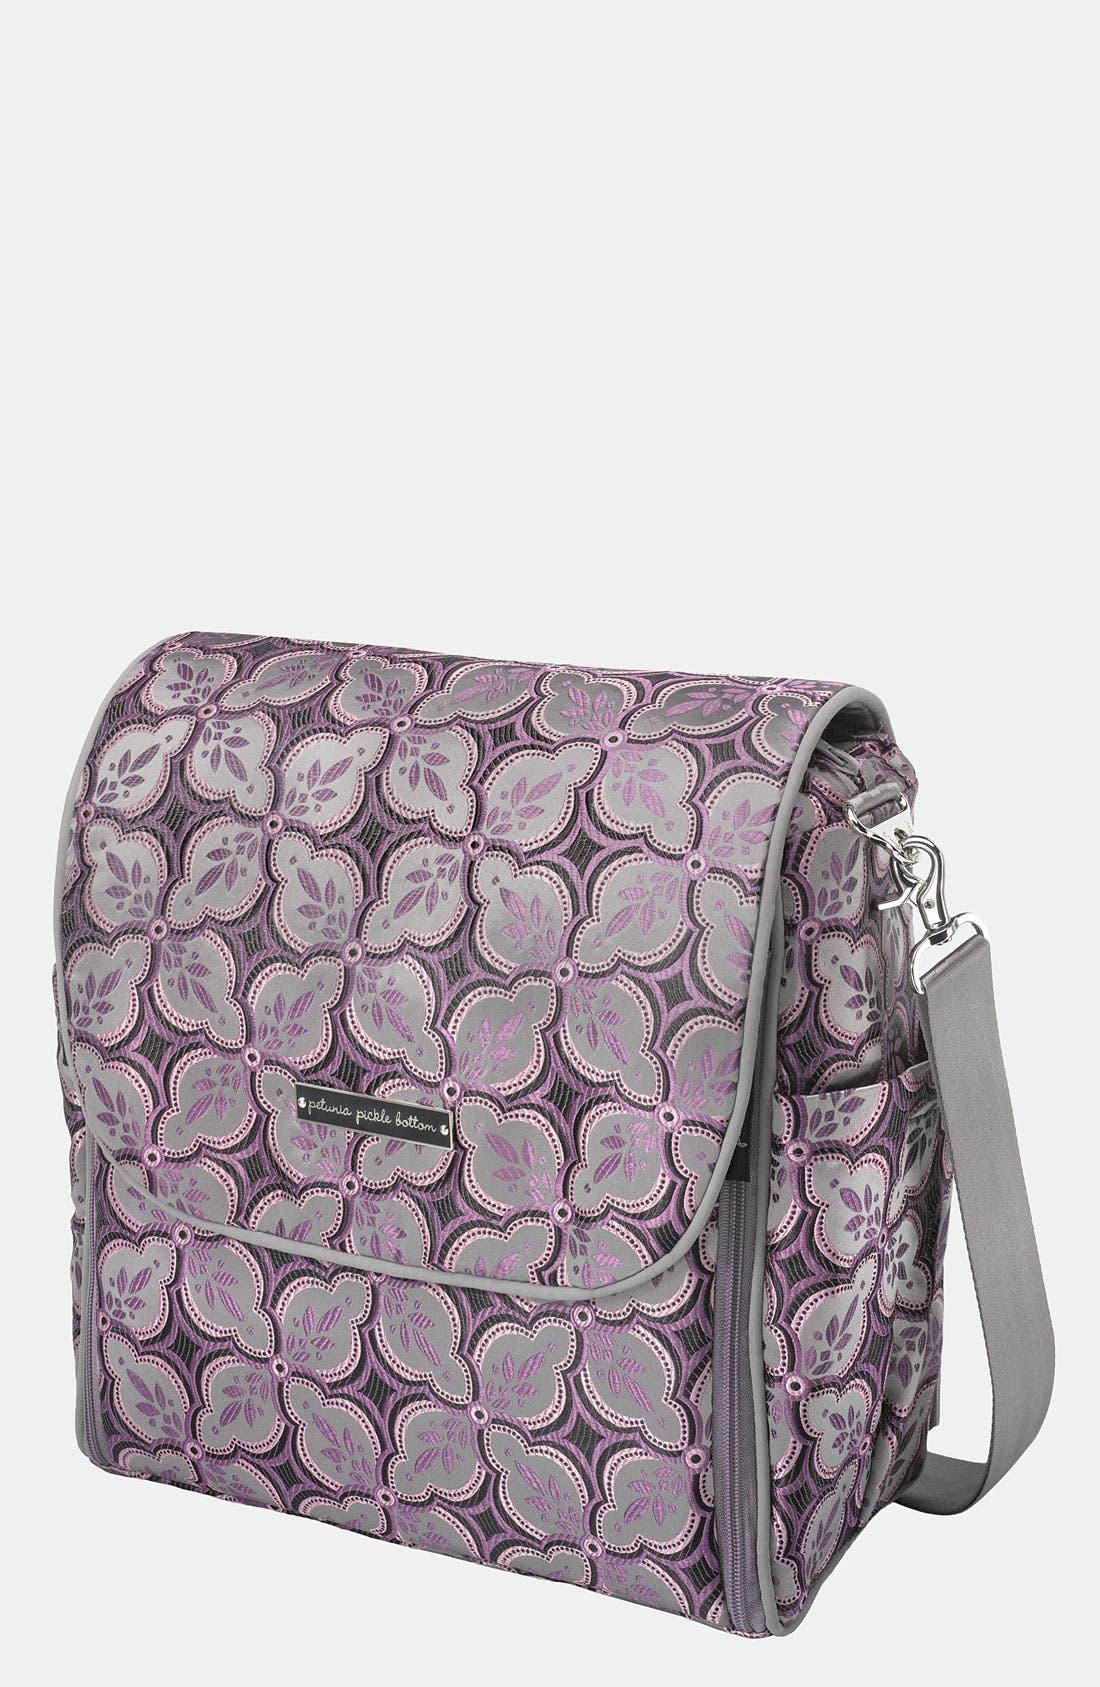 Alternate Image 1 Selected - Petunia Pickle Bottom 'Boxy' Backpack Diaper Bag